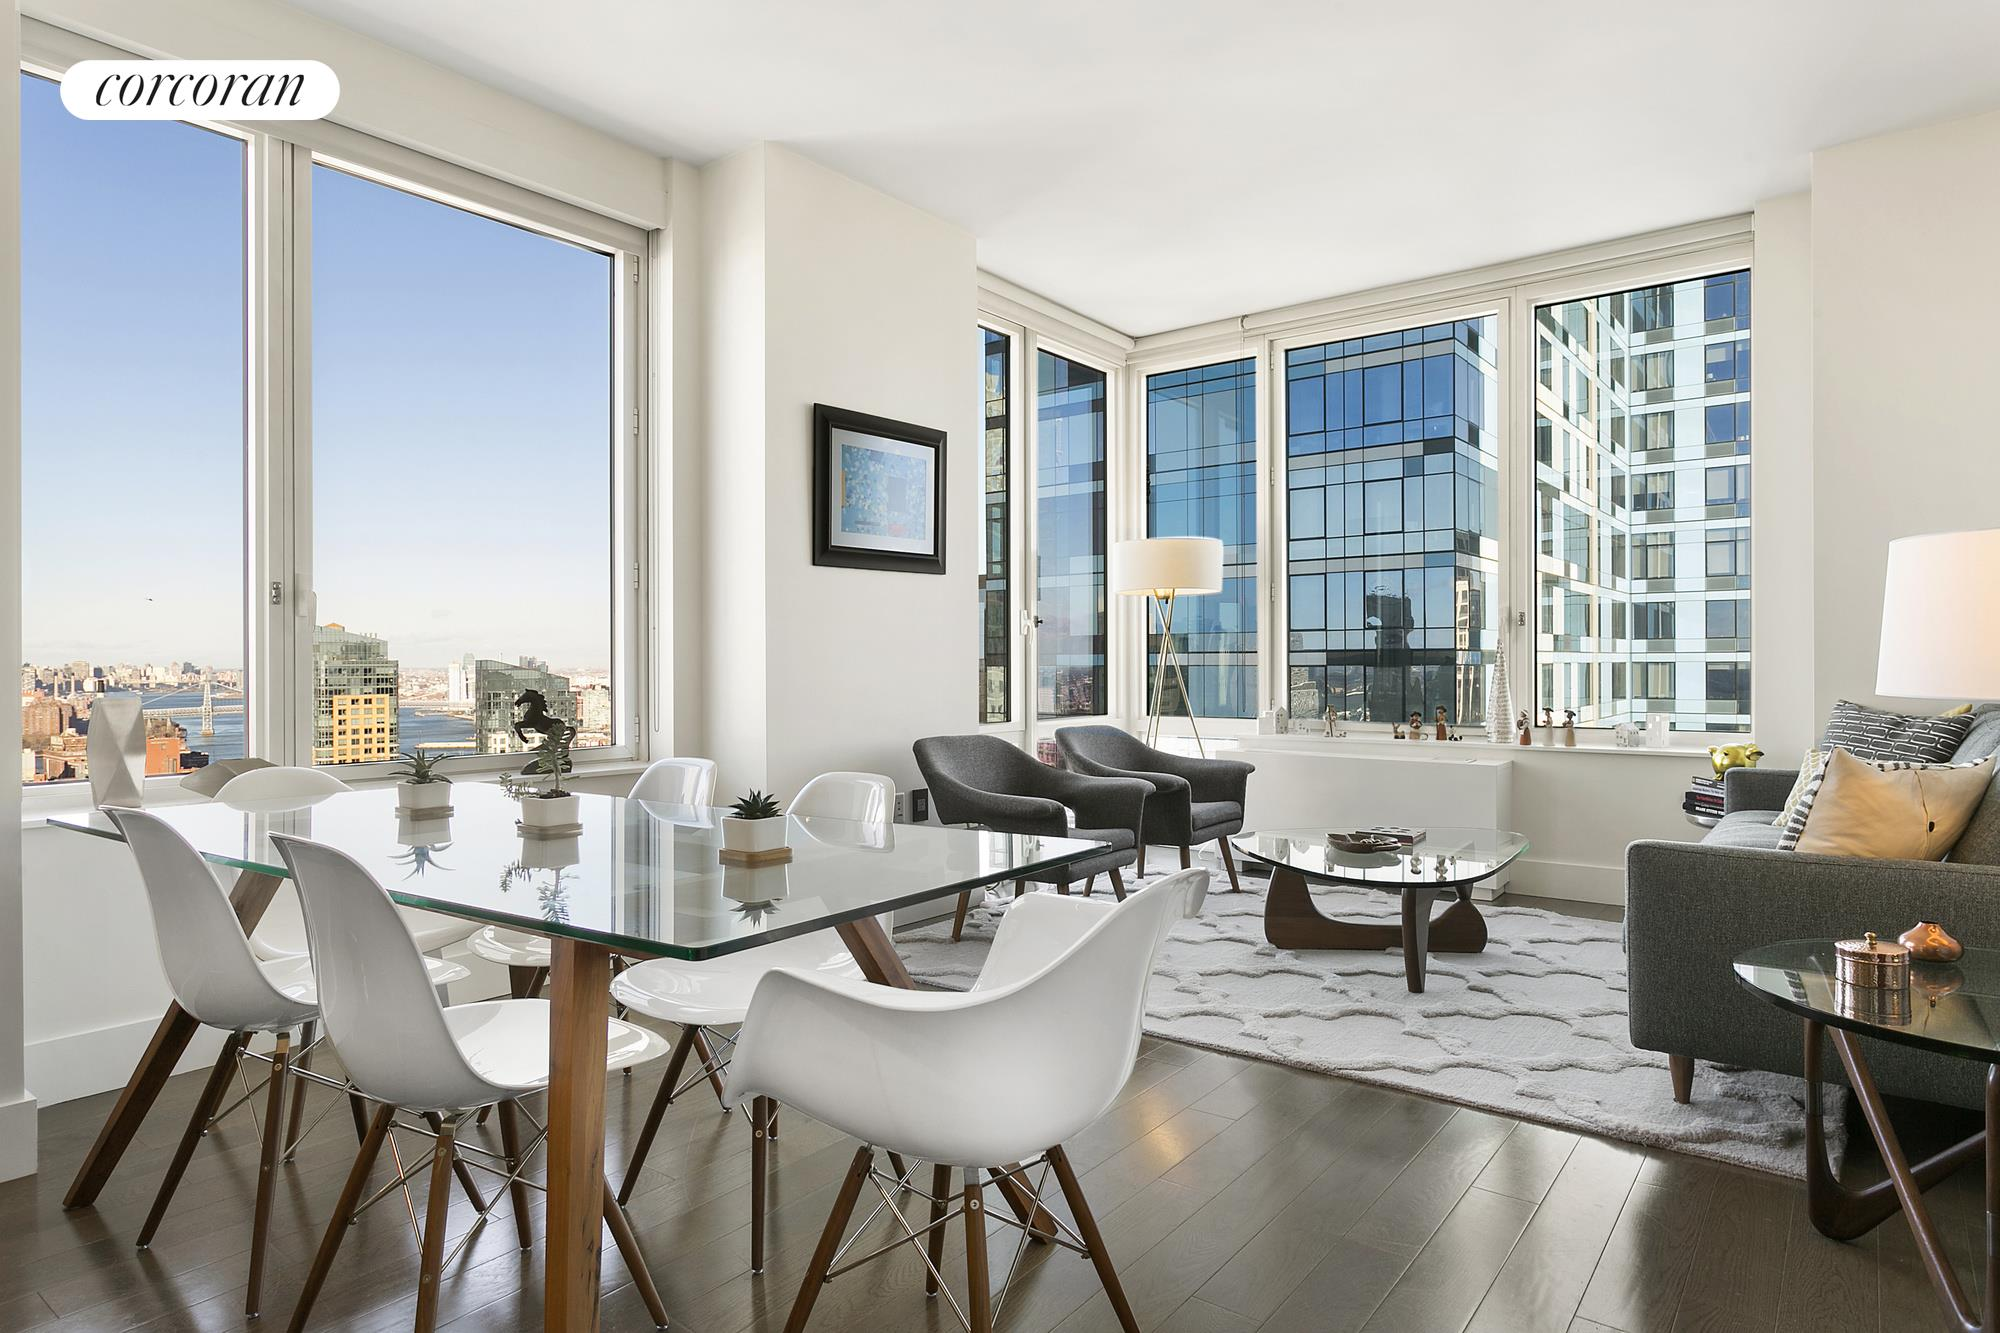 Condominium for Sale at 388 Bridge Street 38-G 388 Bridge Street Brooklyn, New York 11201 United States